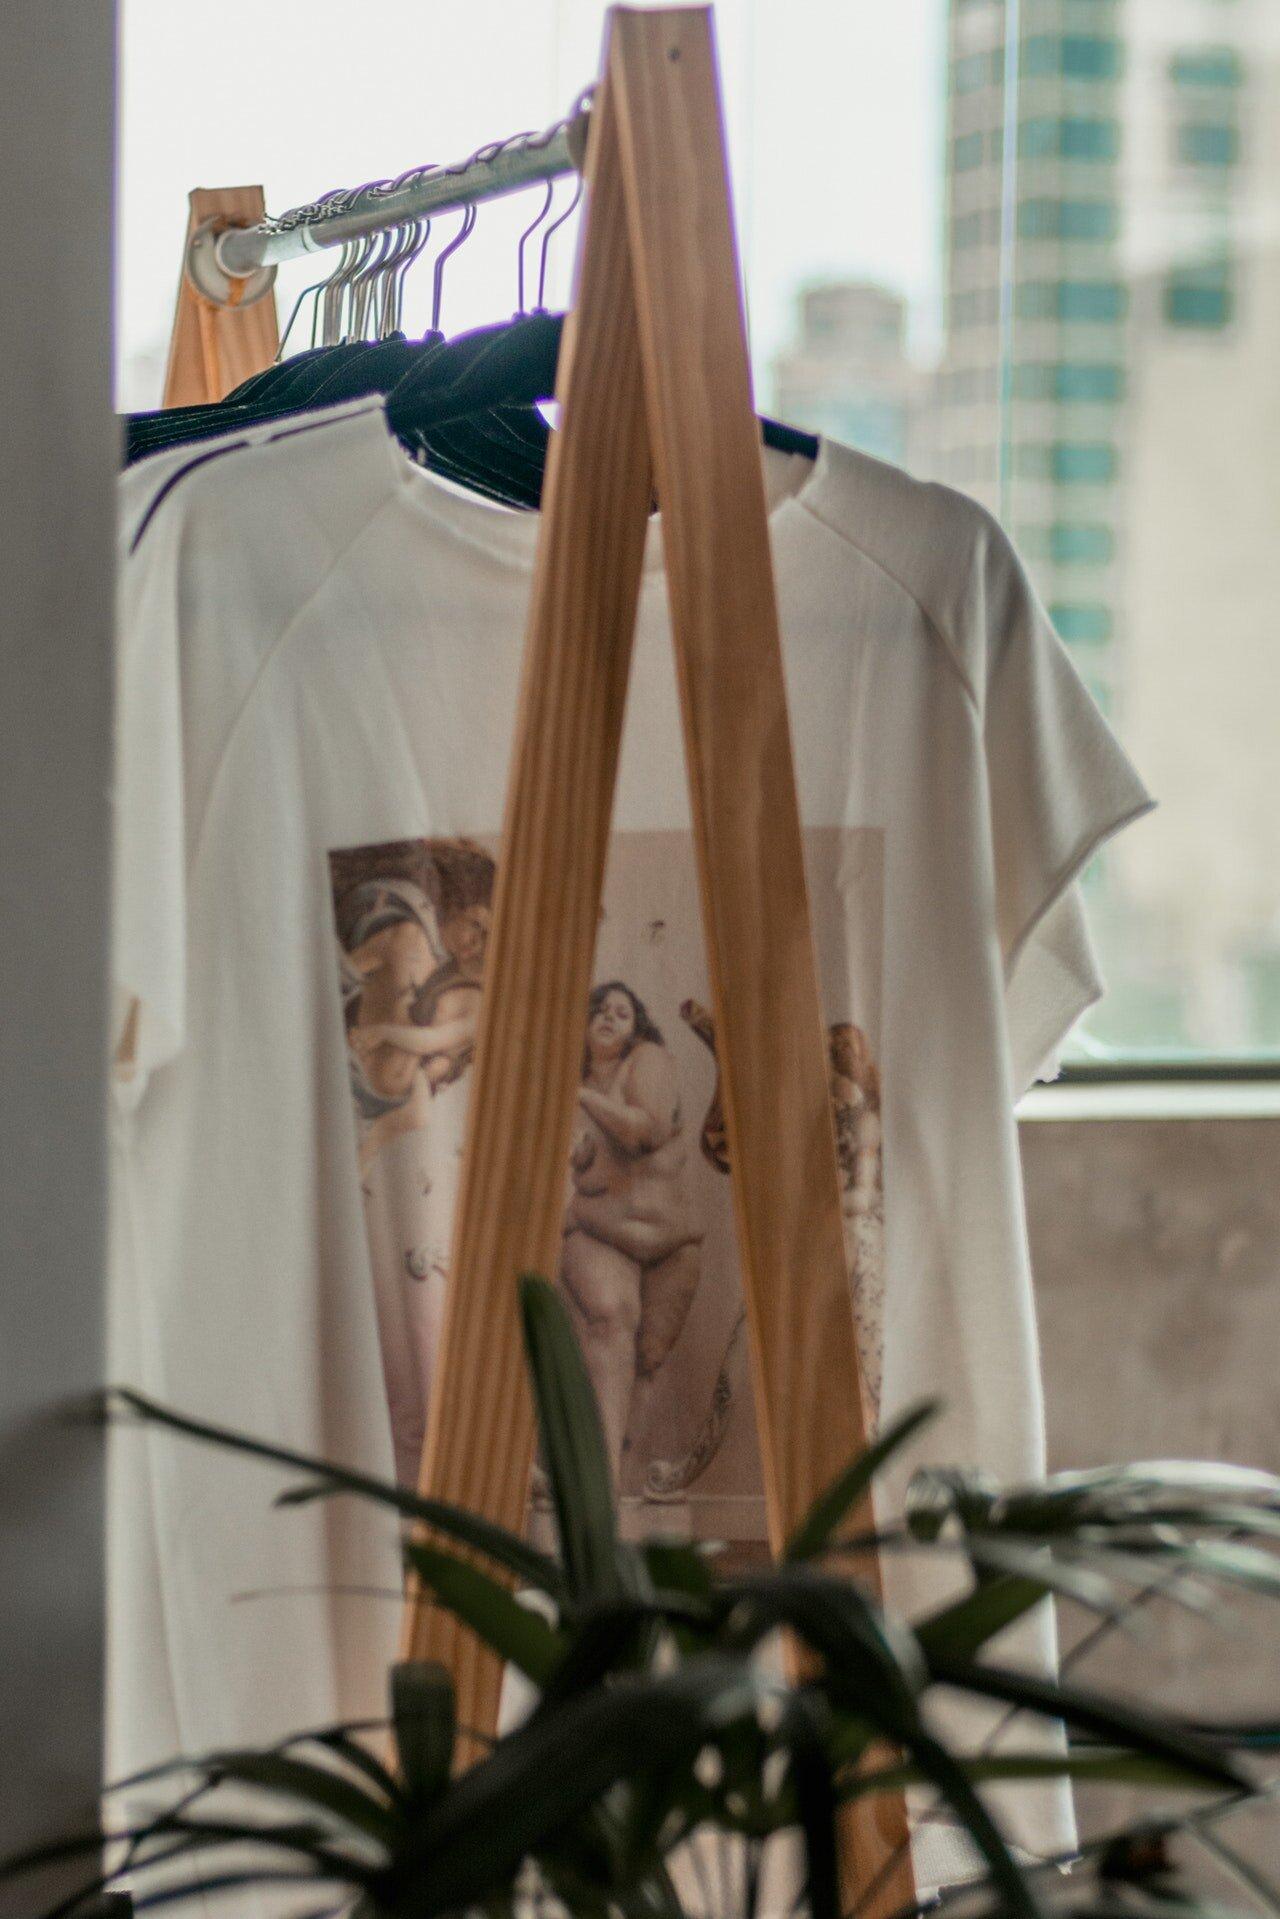 apparel-casual-wear-closet-2112636.jpg